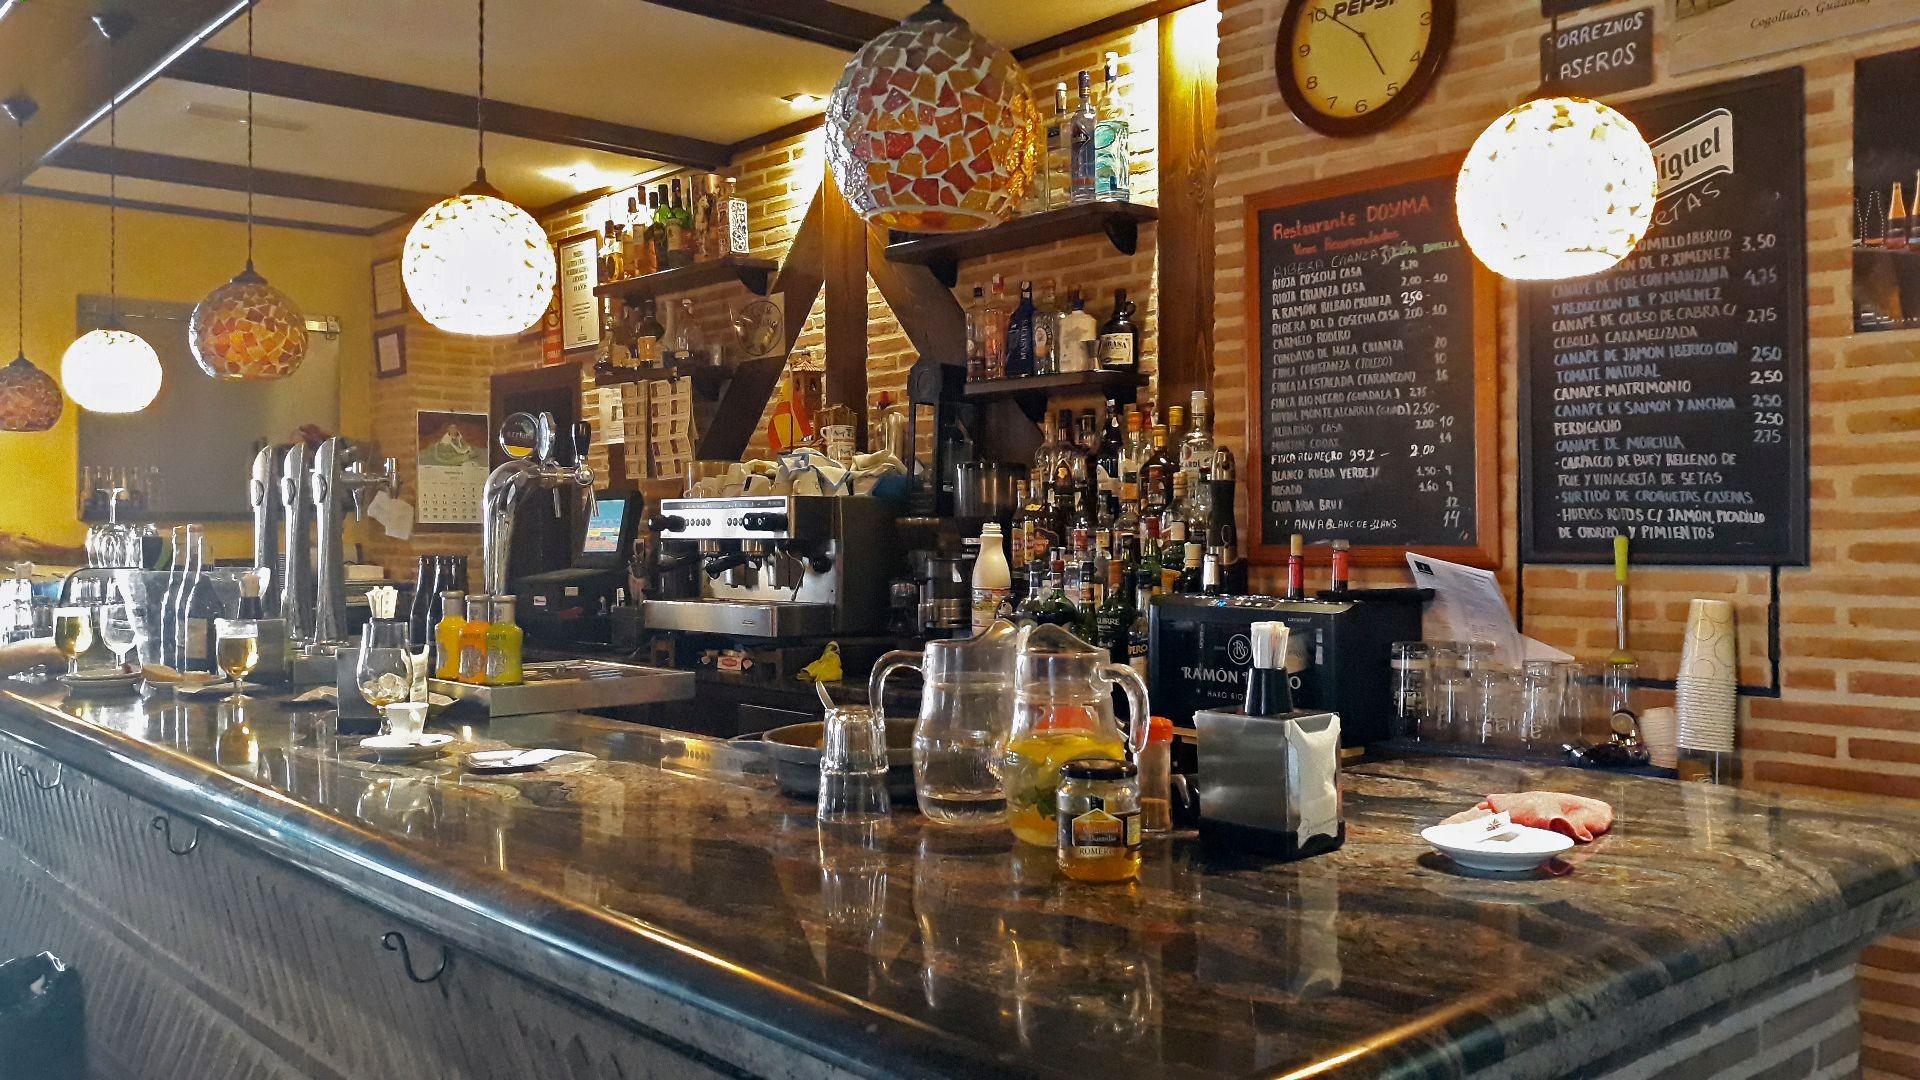 Restaurante de comida casera en Marchamalo